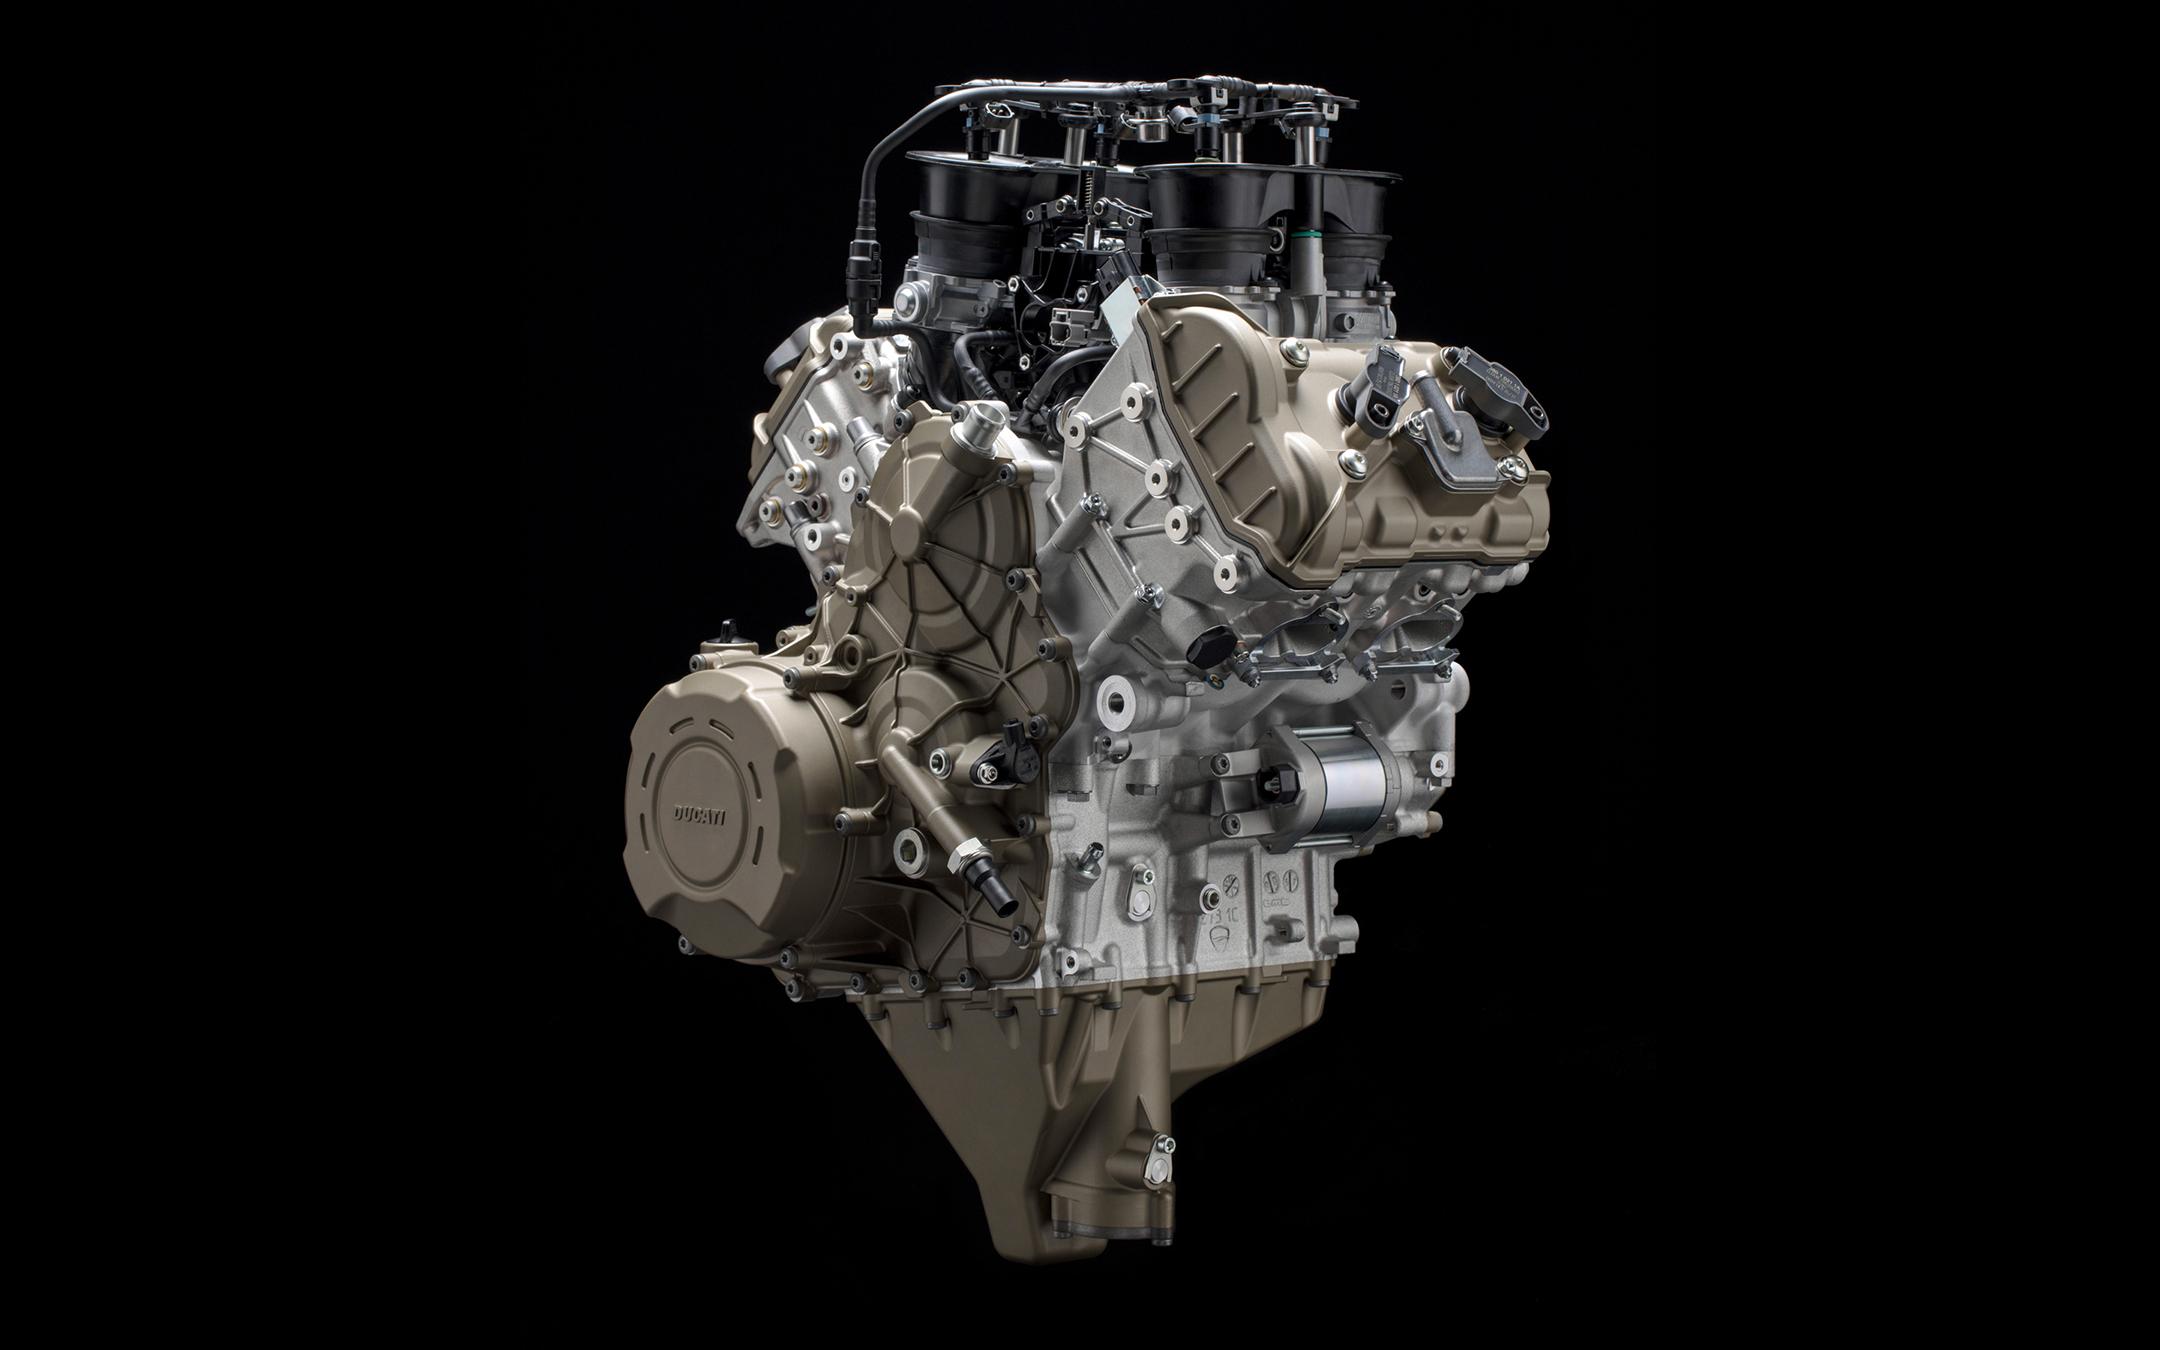 Ducati Panigale V4 - 2018 - Desmosedici Stradale - view engine